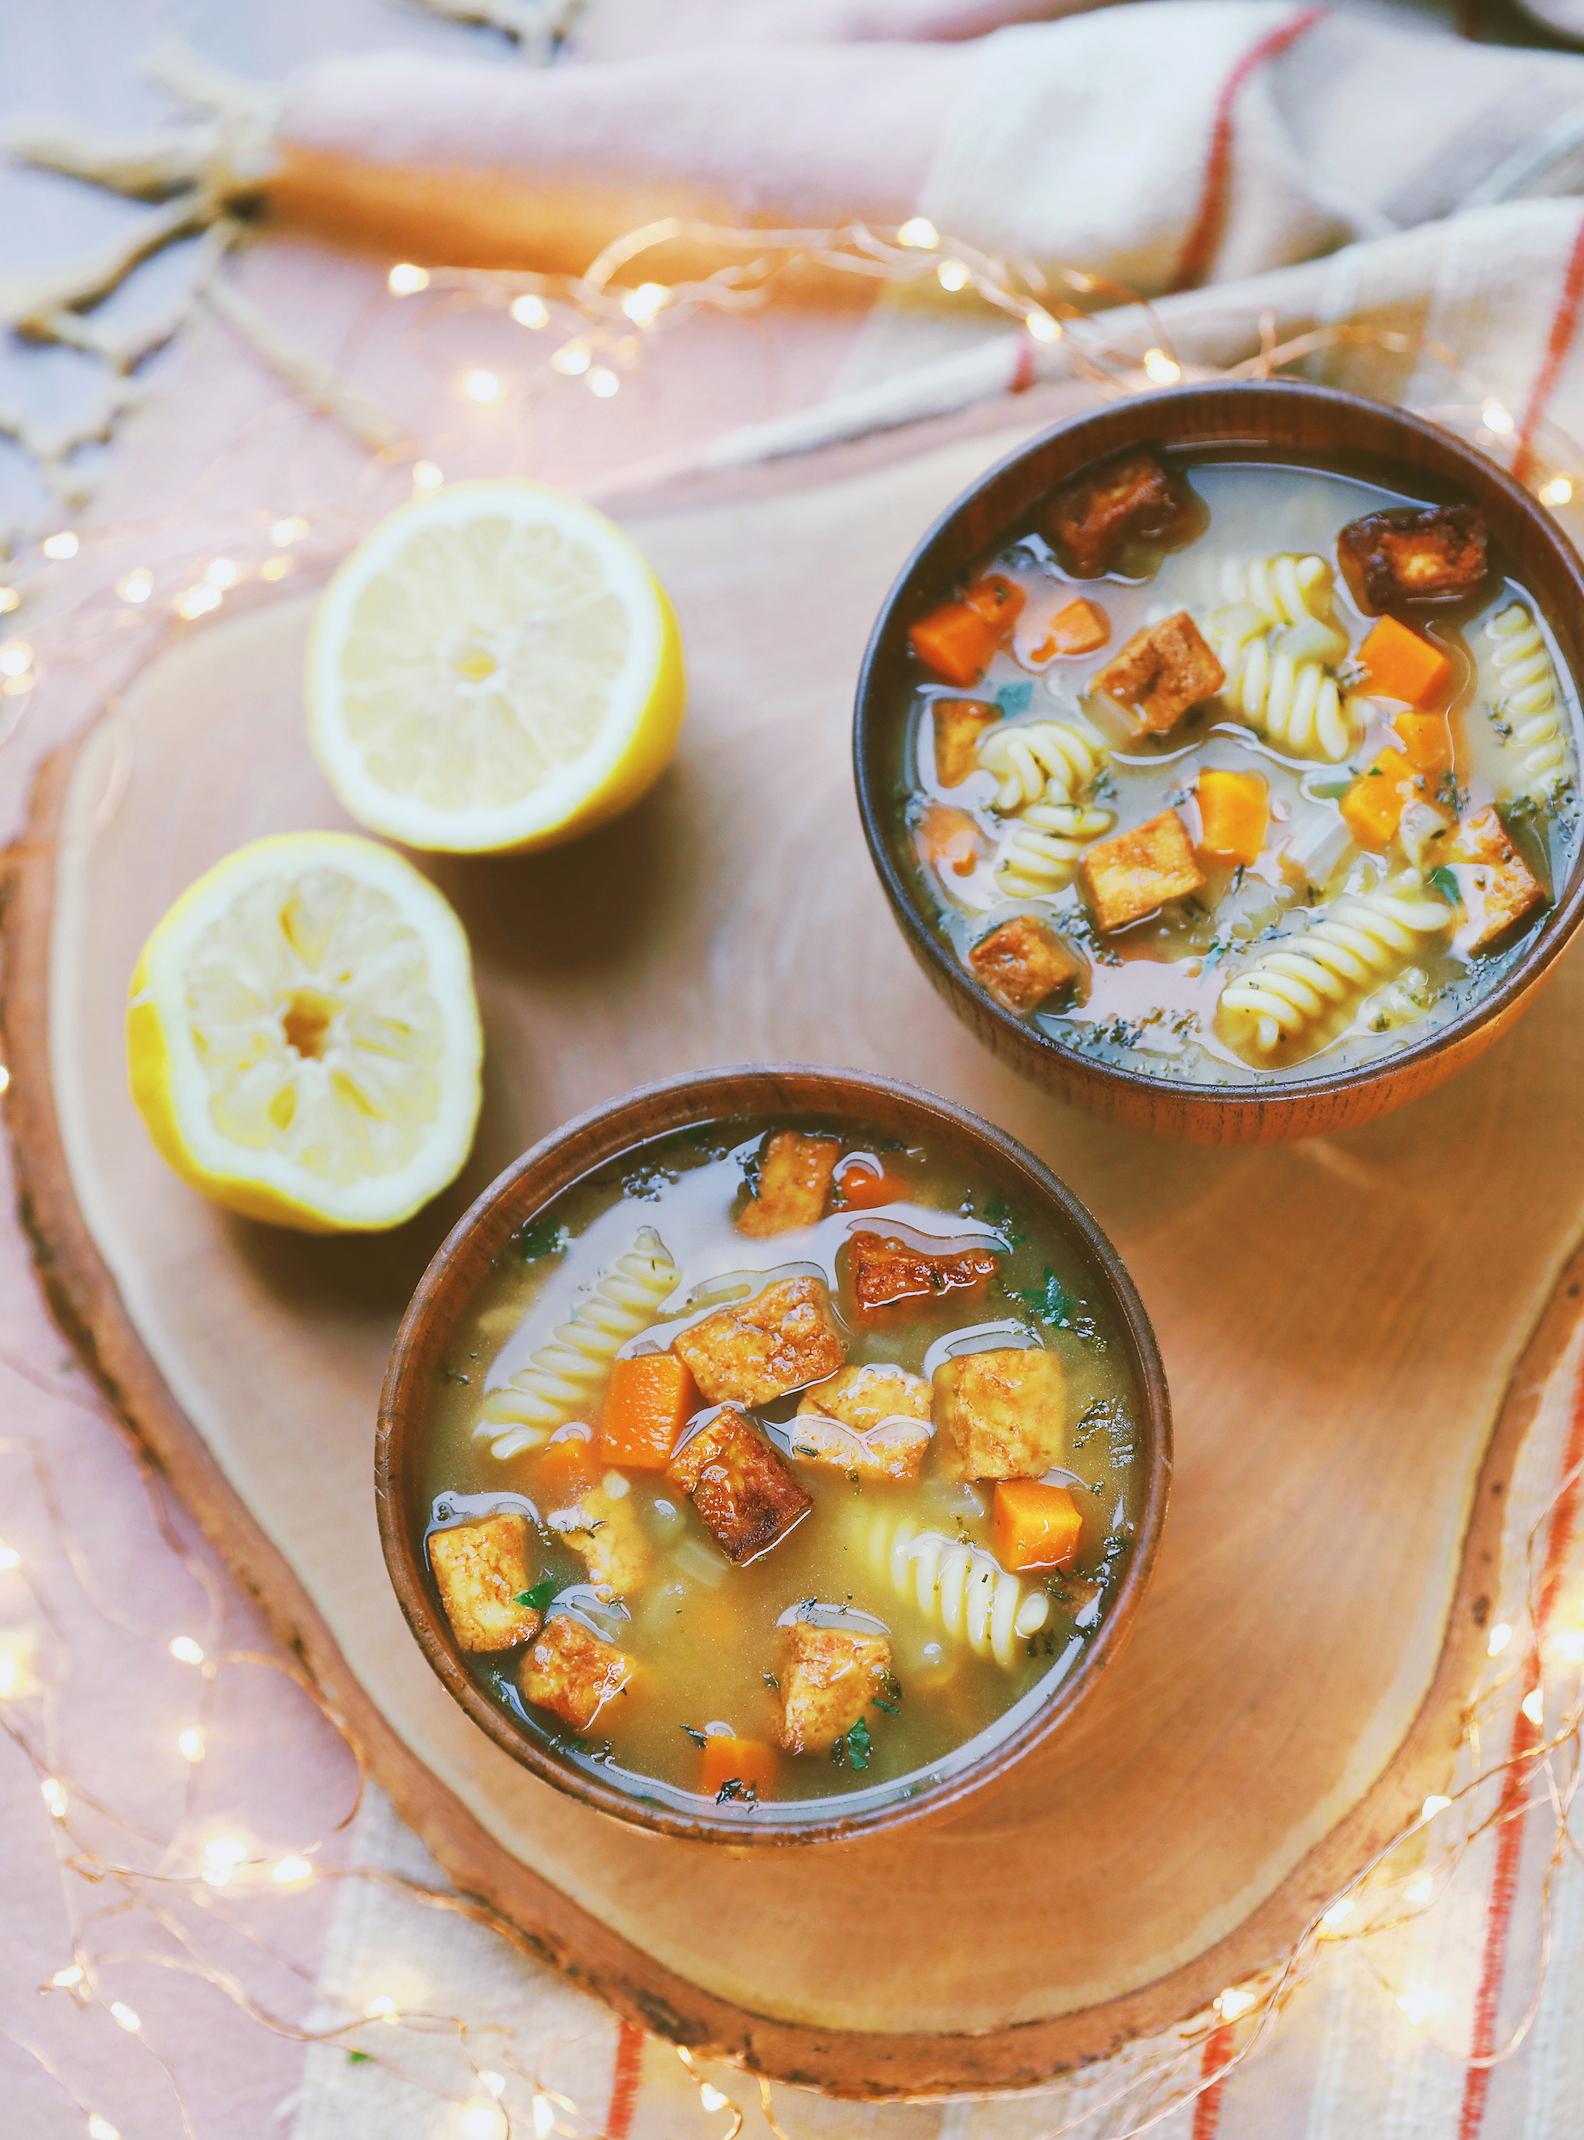 Tofu No-Chicken Noodle Soup